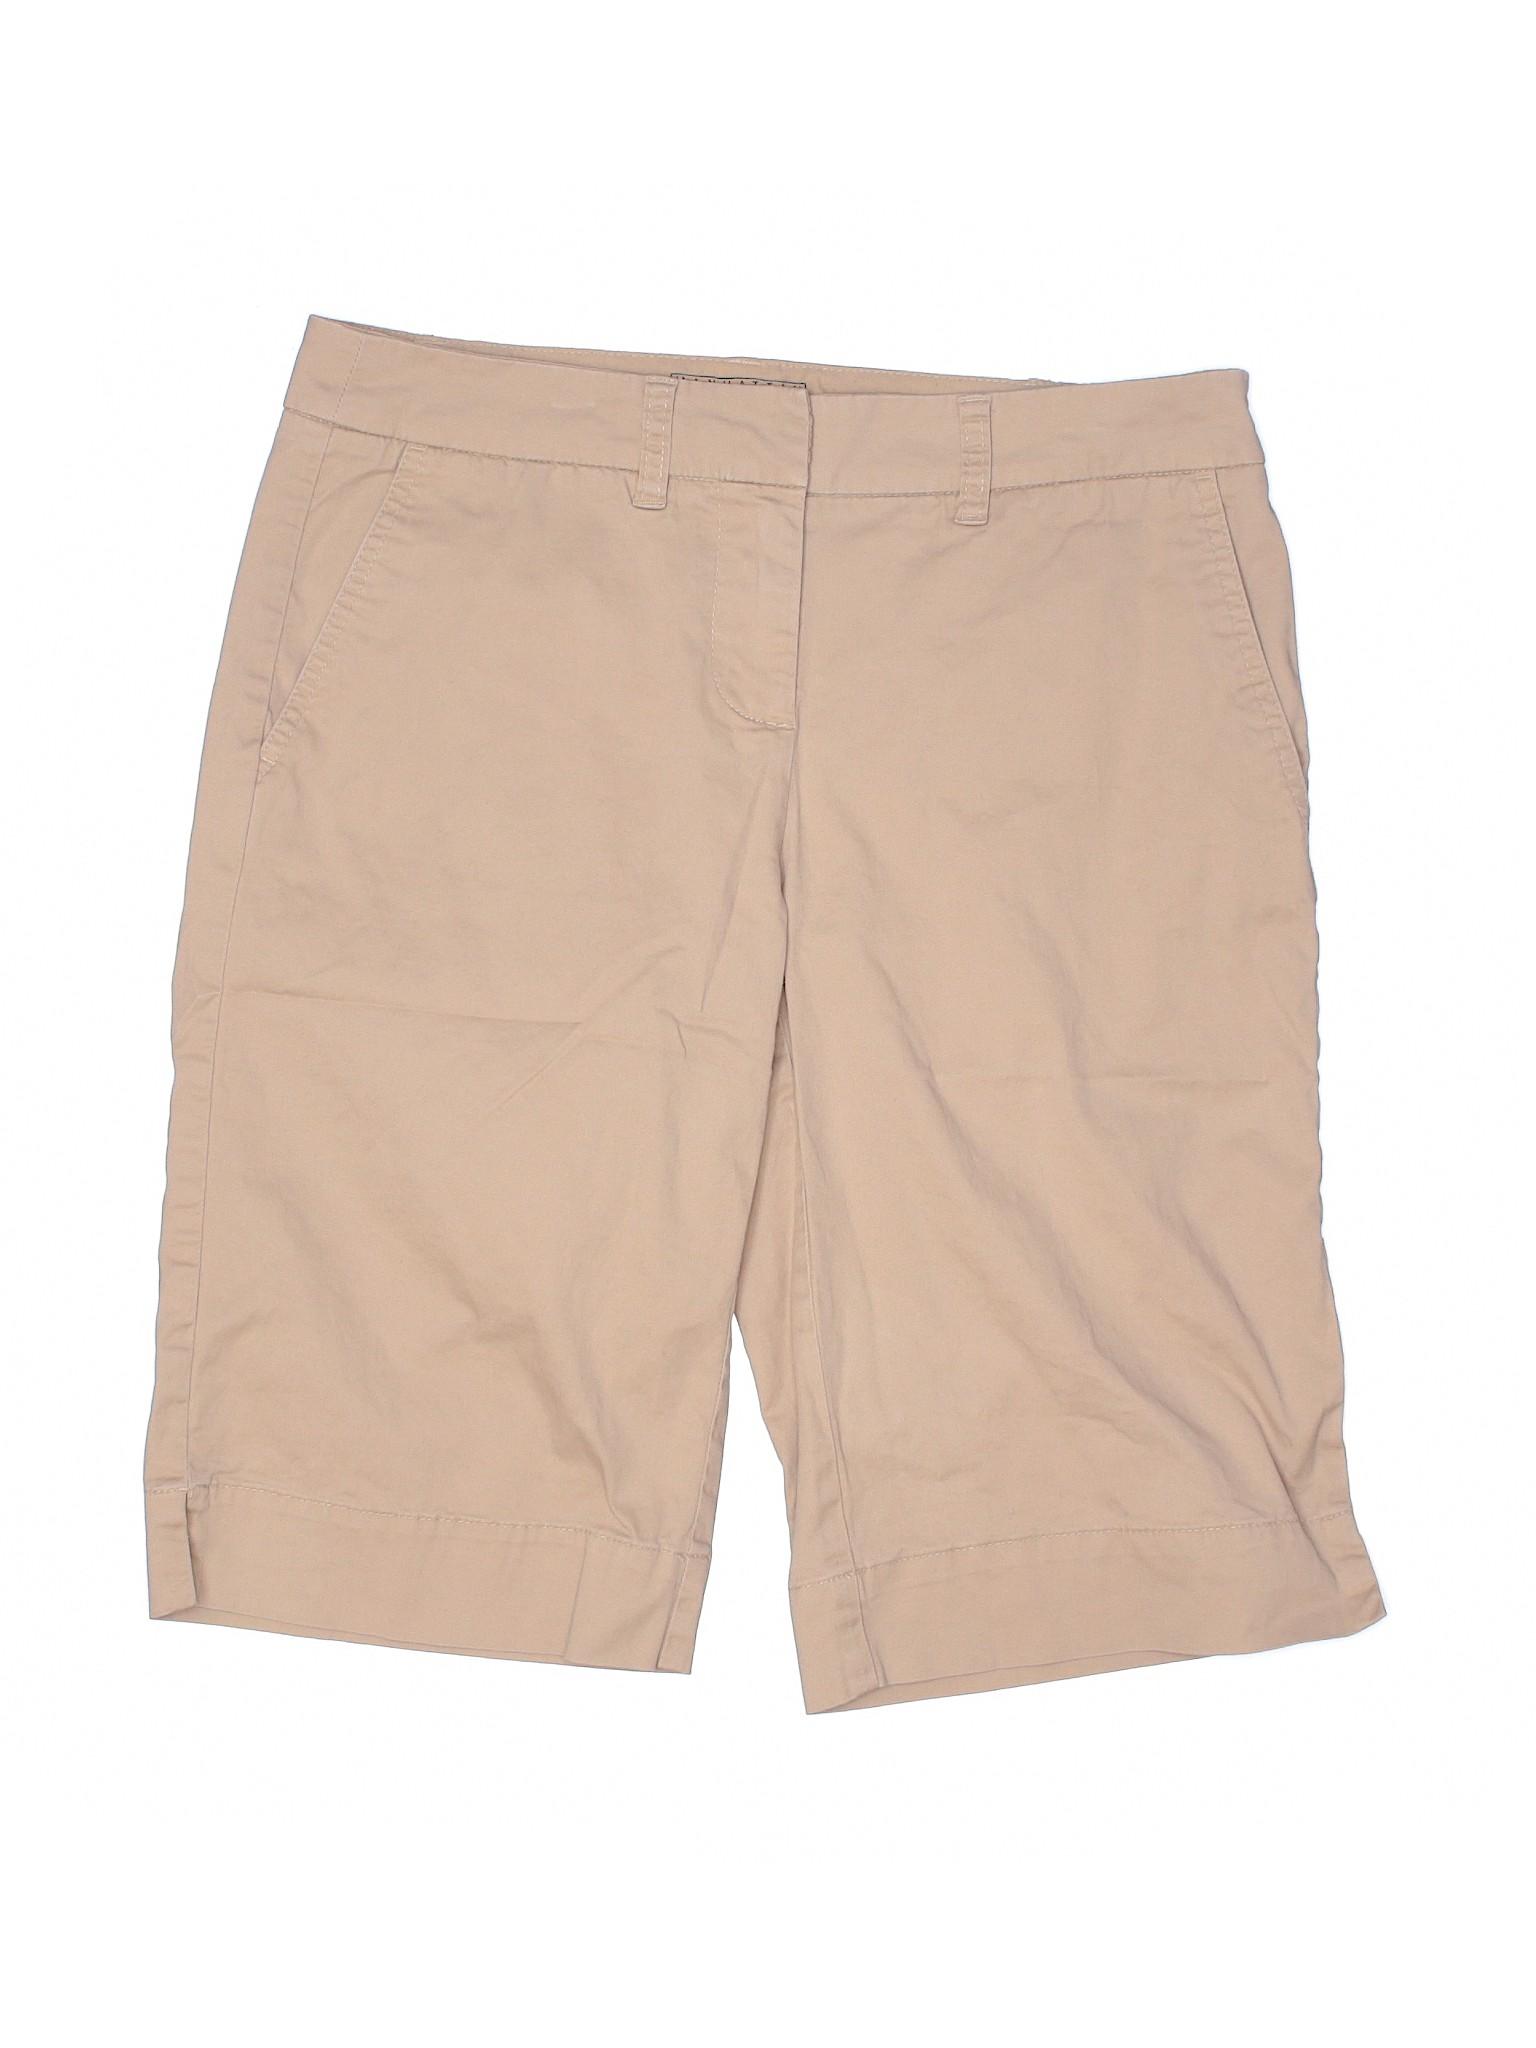 "NWT Women/'s Loft 4/"" Solid Cotton Shorts Size 00 0 2 4 6 8 10 12 14 16"